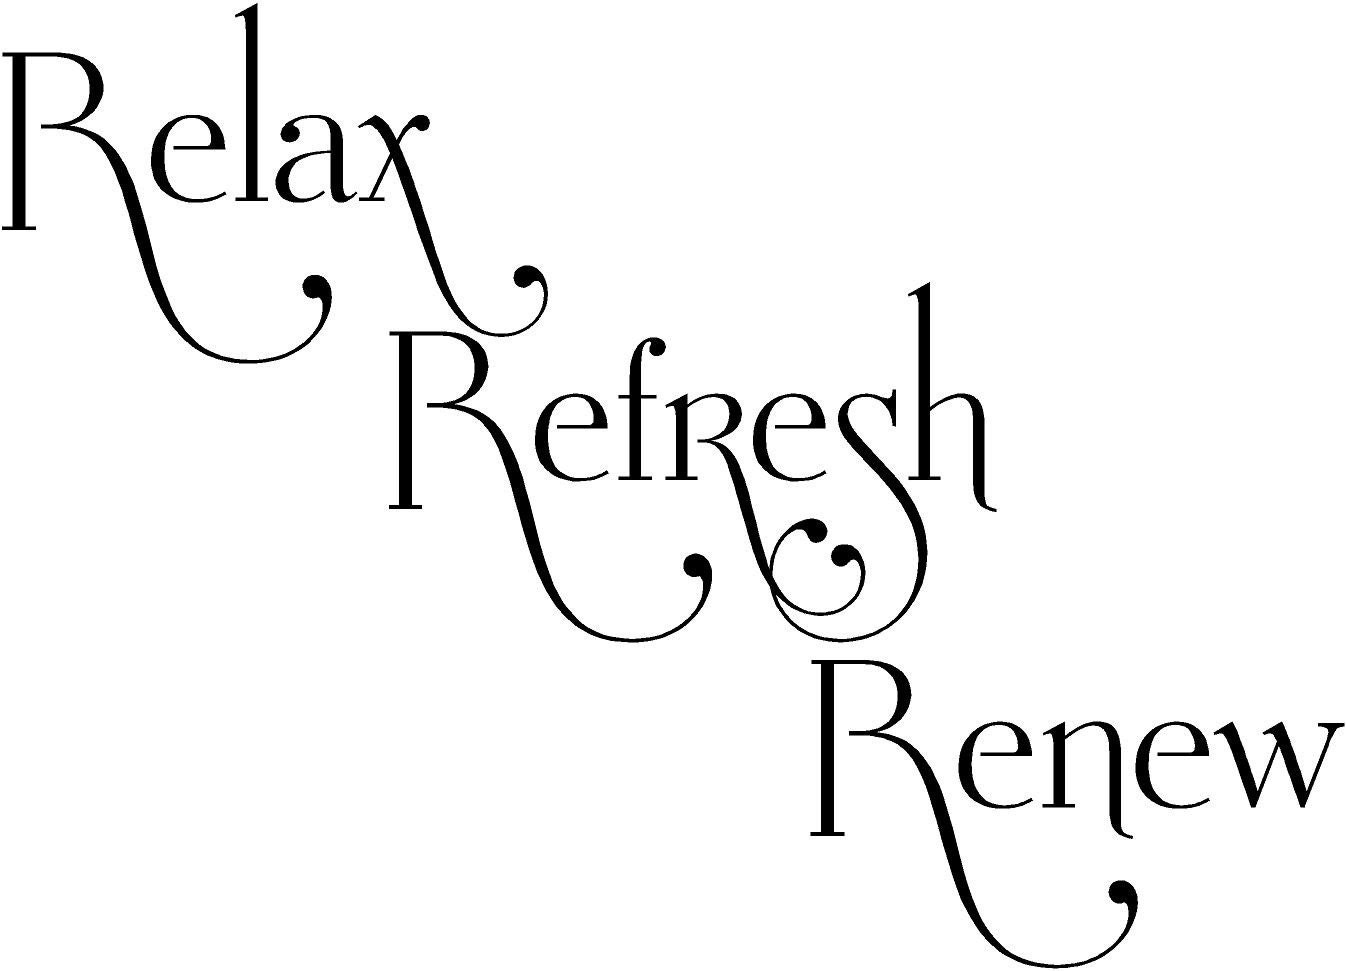 Relax Refresh Renew Bathroom Vinyl Lettering Wall Words